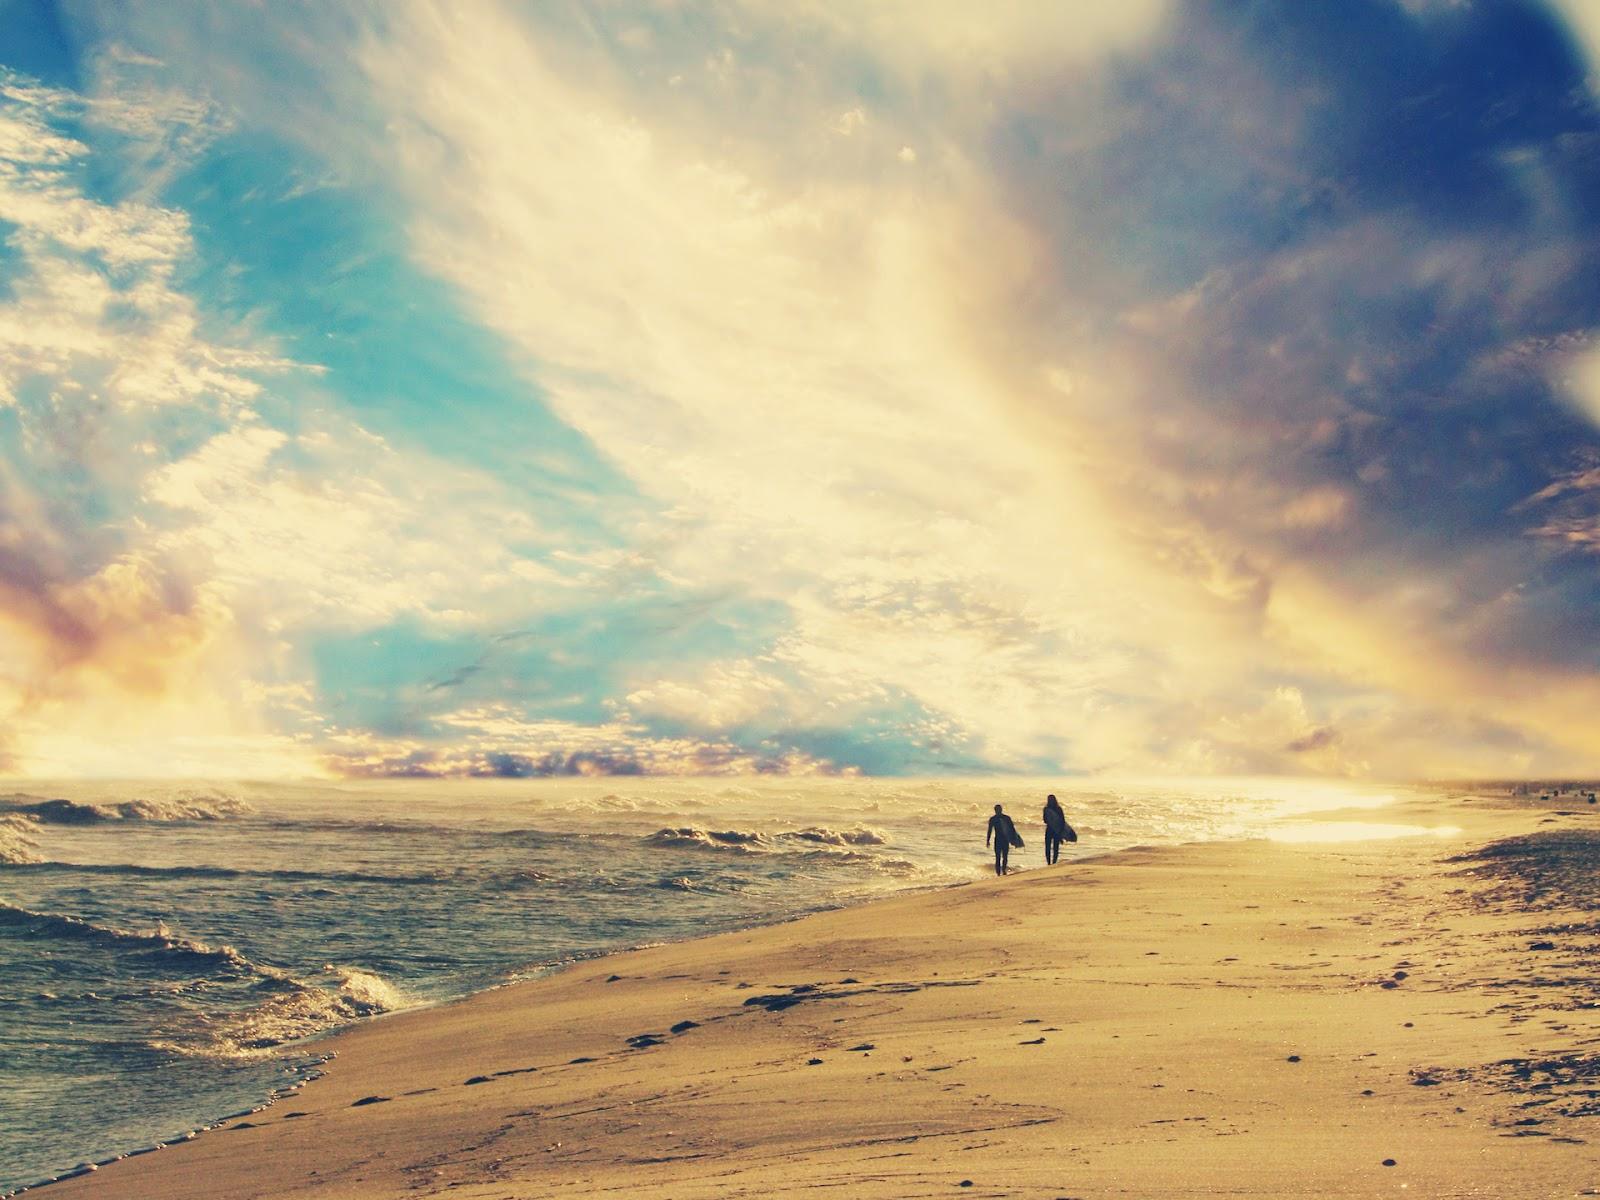 http://3.bp.blogspot.com/-EoBx-r82rrw/UCIlcbD_RNI/AAAAAAAAG3U/sp9XMbRdM98/s1600/surf-wallpaper-6.jpg